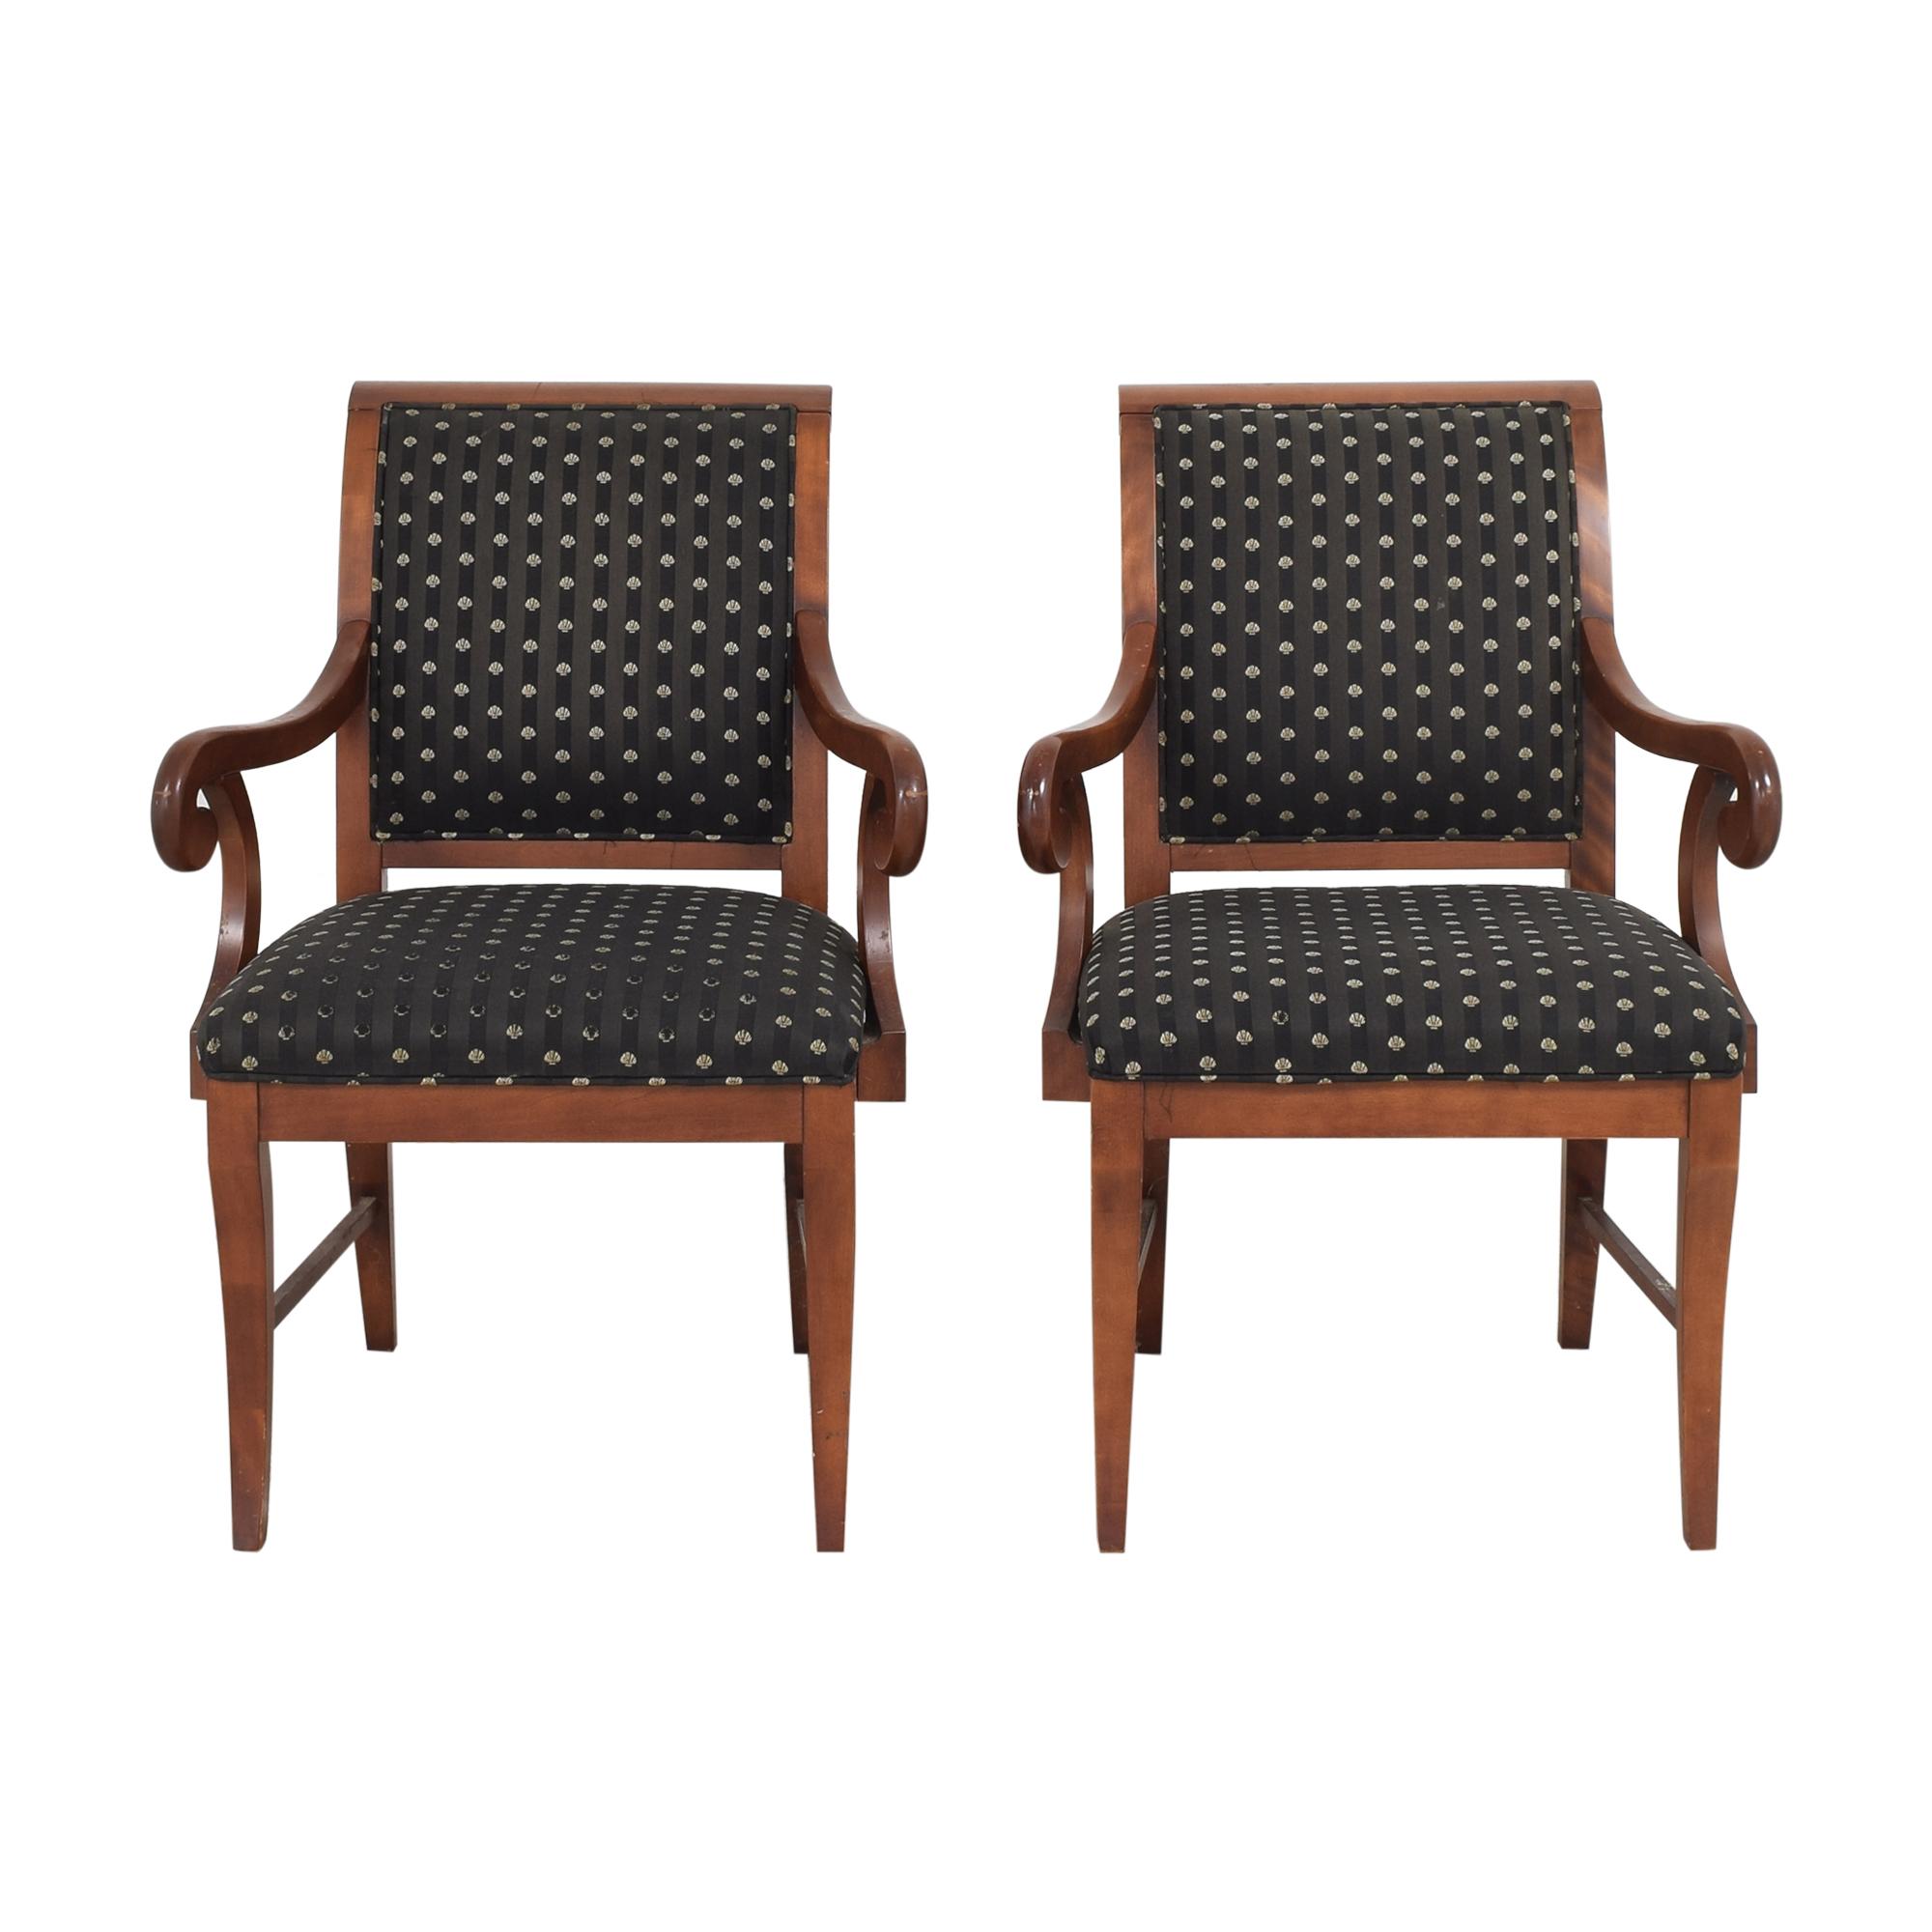 shop Leda Furniture Leda Furniture Arm Chairs online